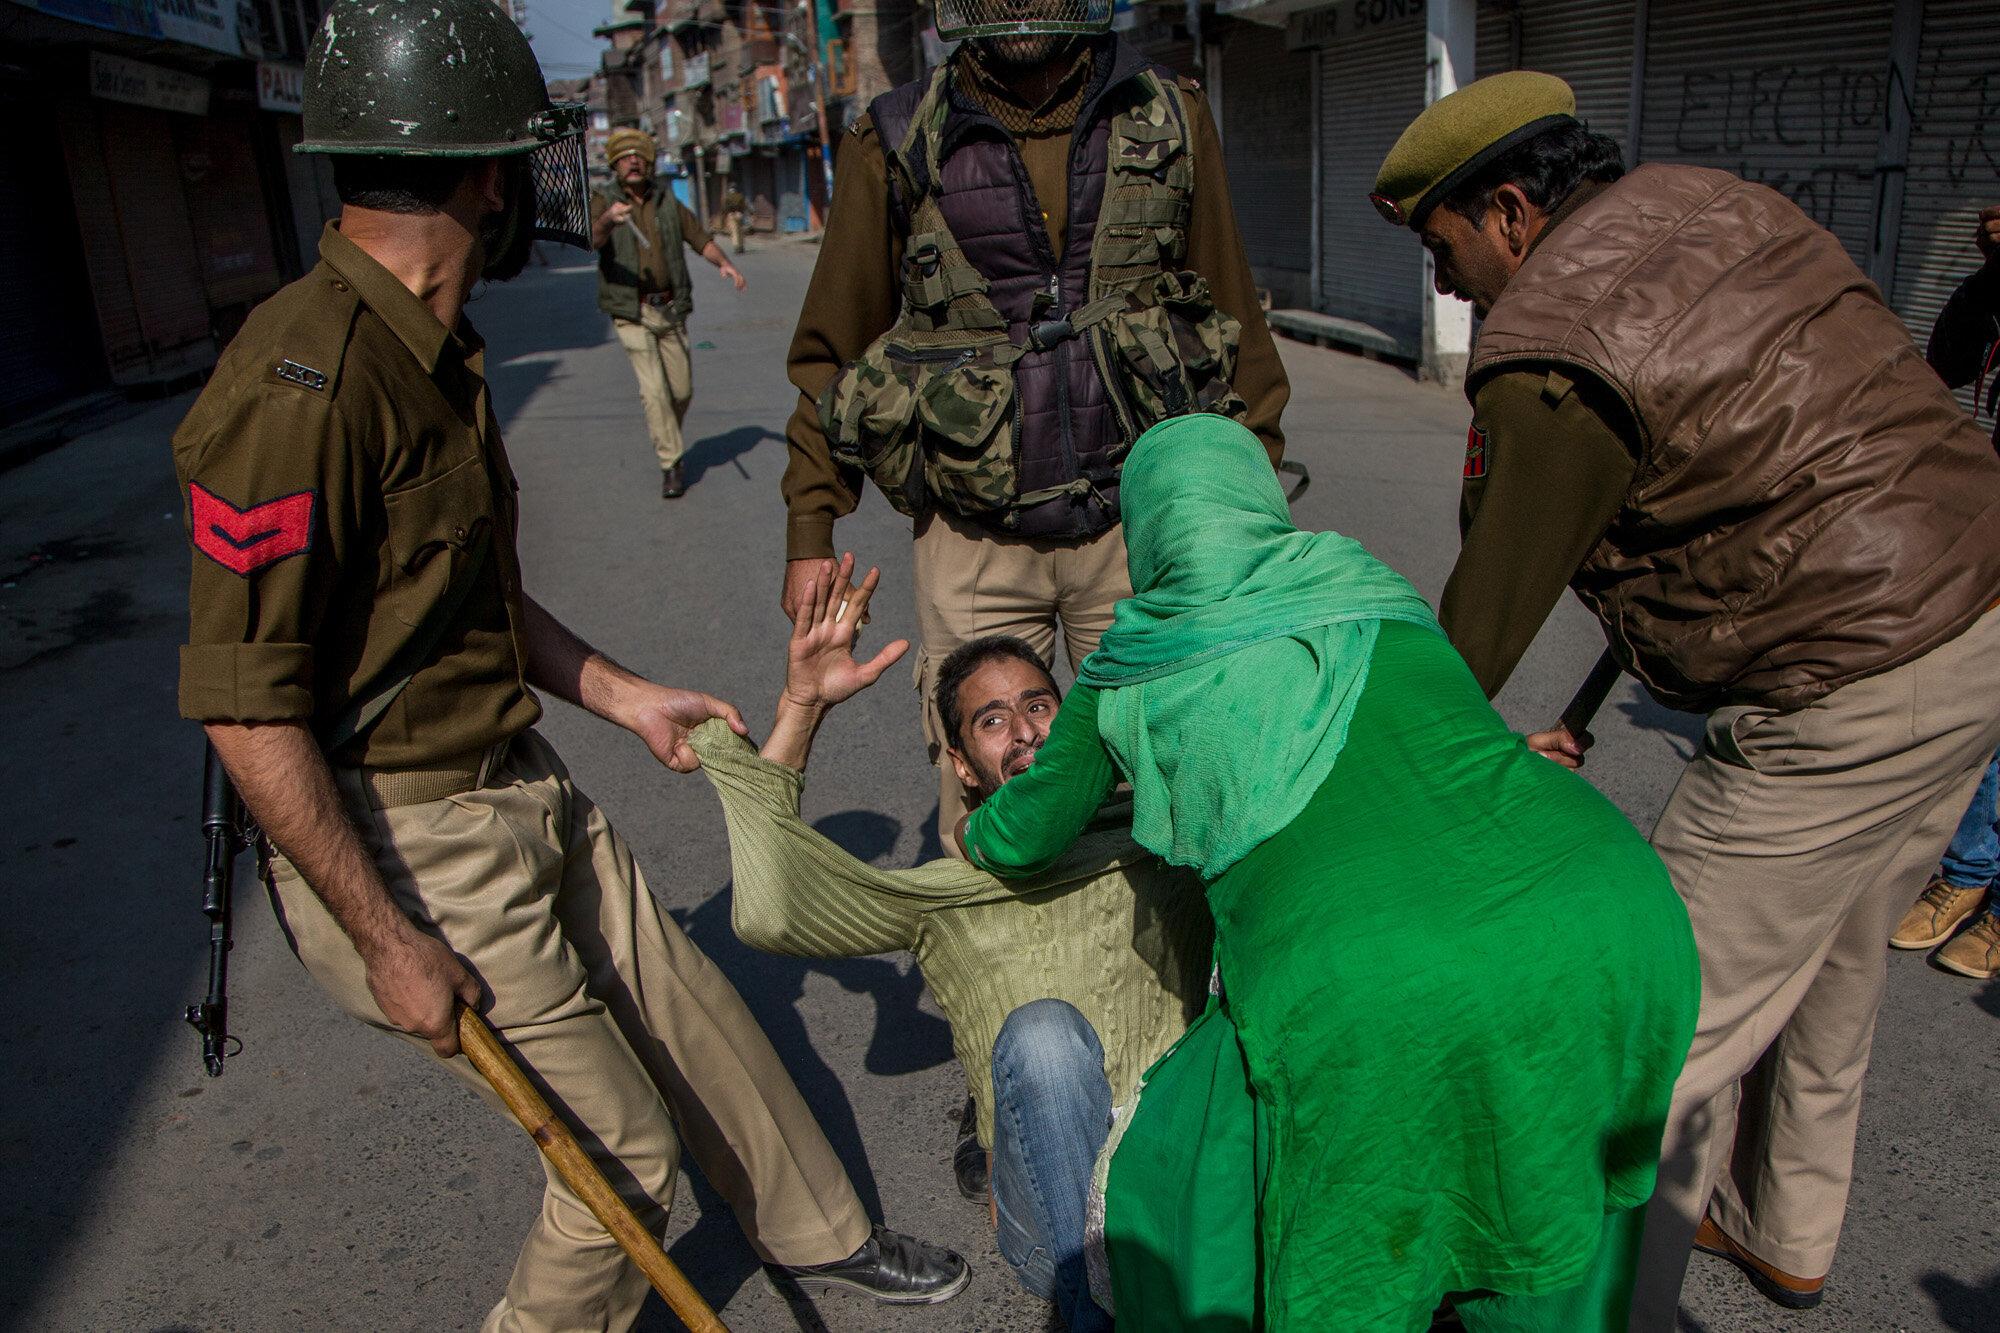 Indian police men try to detain Kashmiri man during a protest in Srinagar, Indian controlled Kashmir, Oct. 22, 2016. (AP Photo/Dar Yasin)